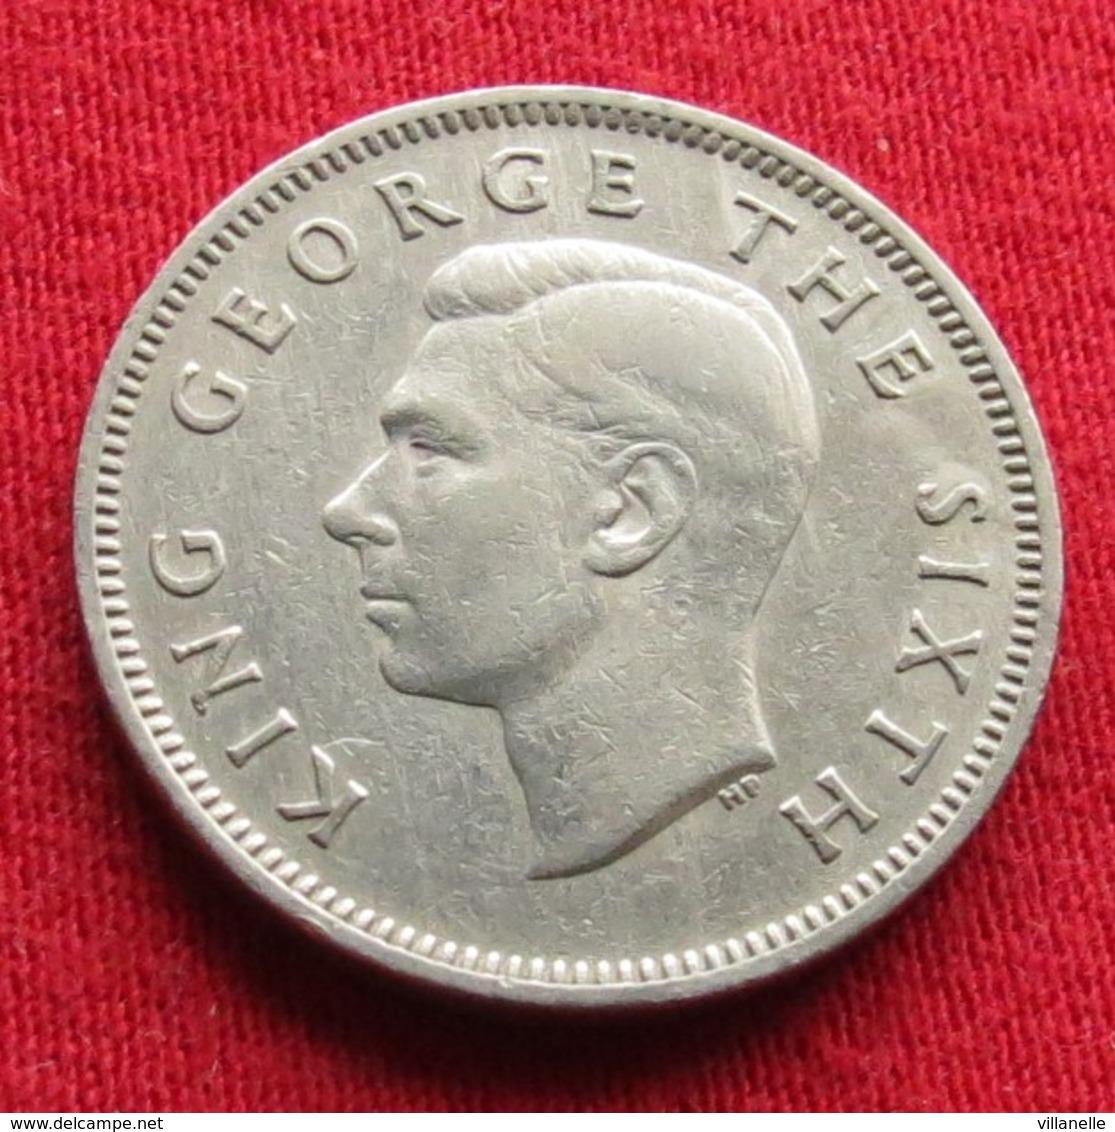 New Zealand 1 Shilling 1948 KM# 17  Nova Zelandia Nuova Zelanda Nouvelle Zelande - Nouvelle-Zélande